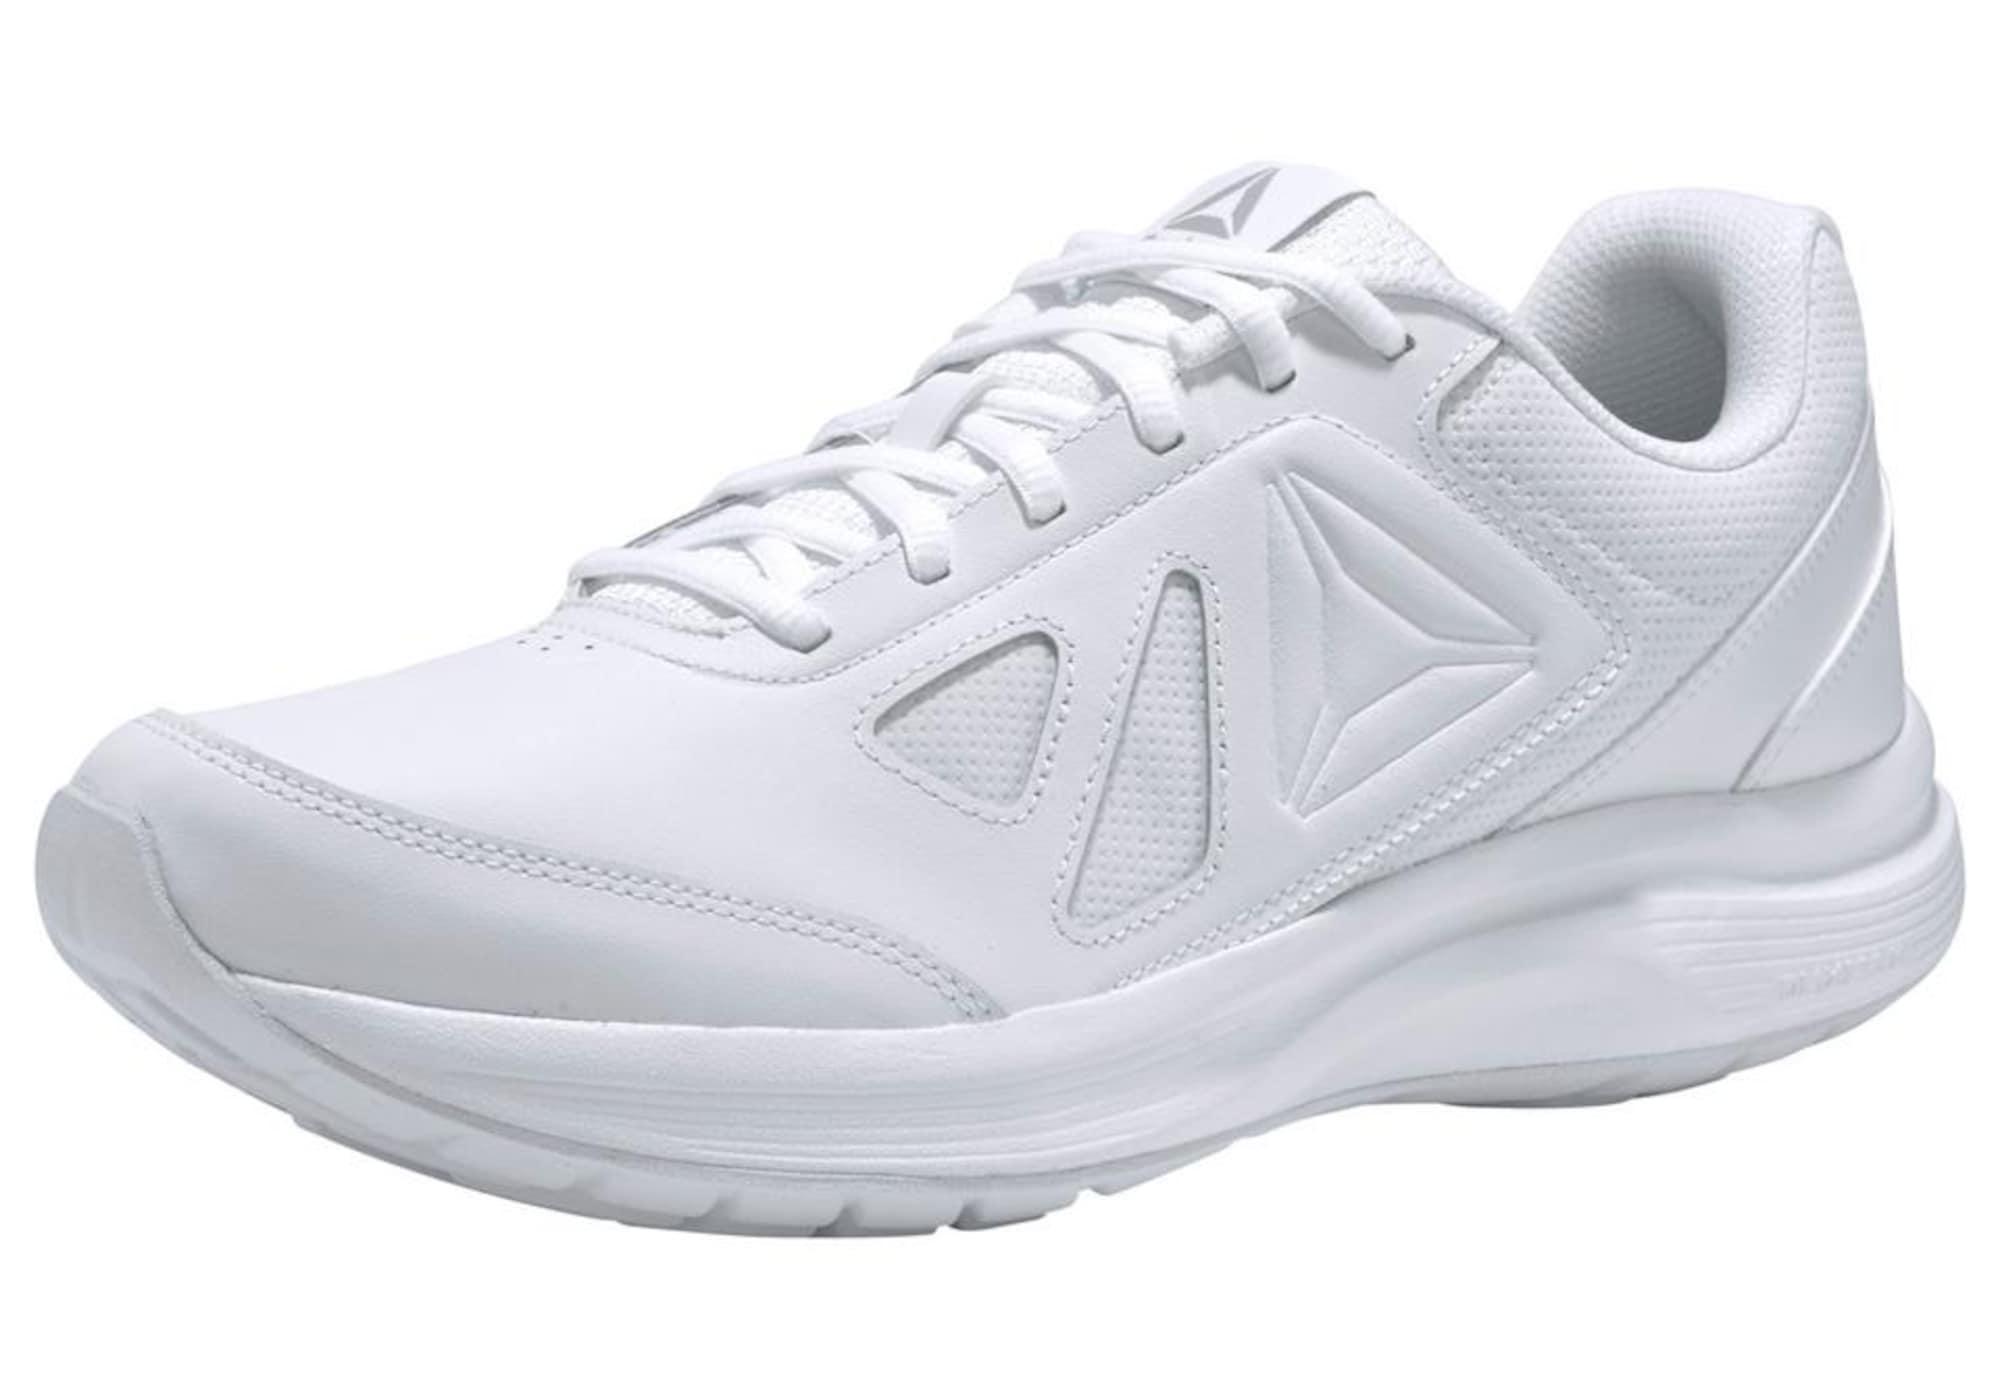 Walkingschuh 'Walk Ultra 6 DMX MA' | Schuhe > Sportschuhe > Walkingschuhe | Weiß | Reebok